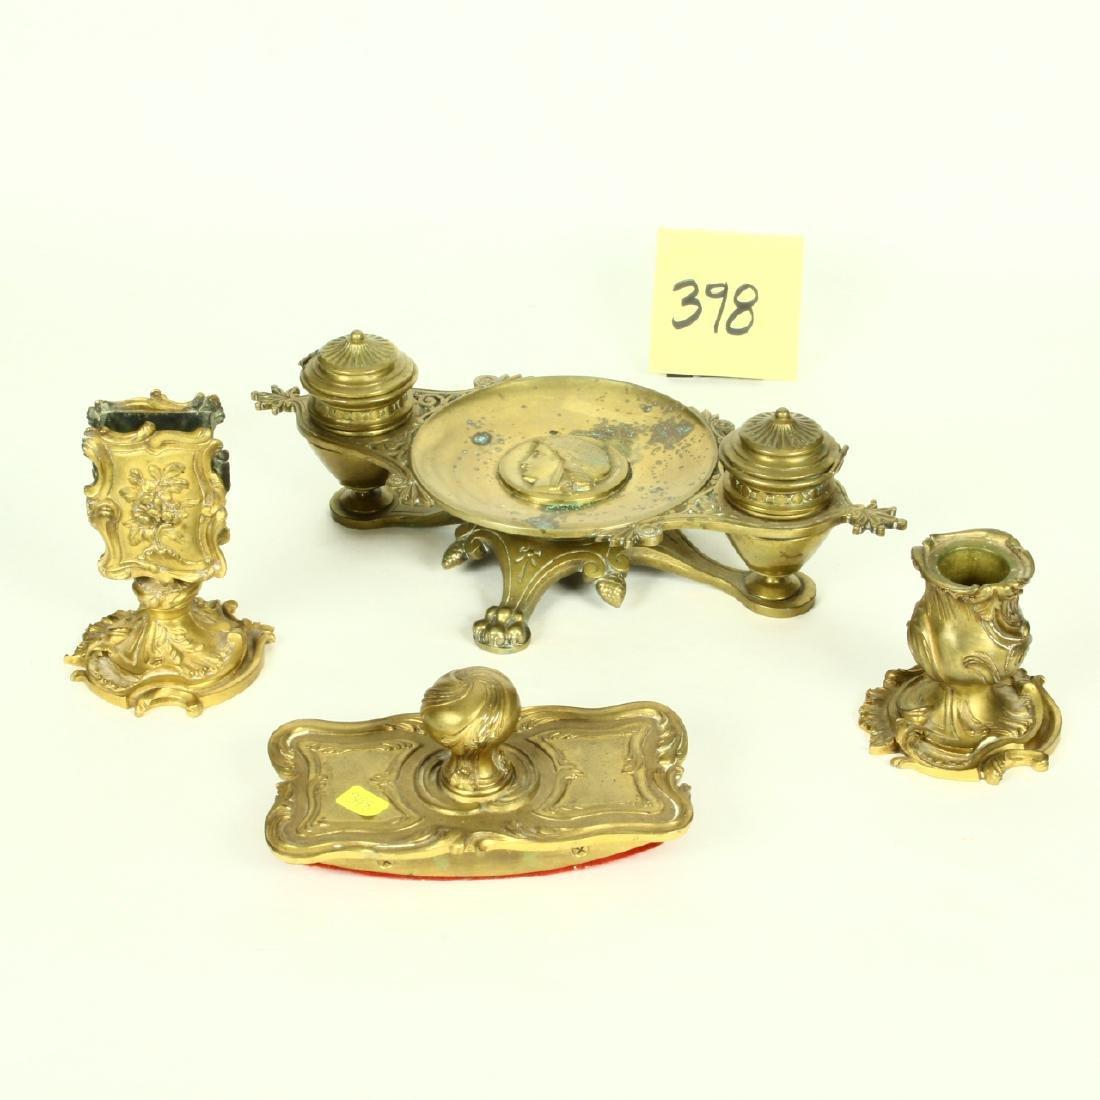 Victorian Ornate Brass Desk Set Ink Well Match Holder